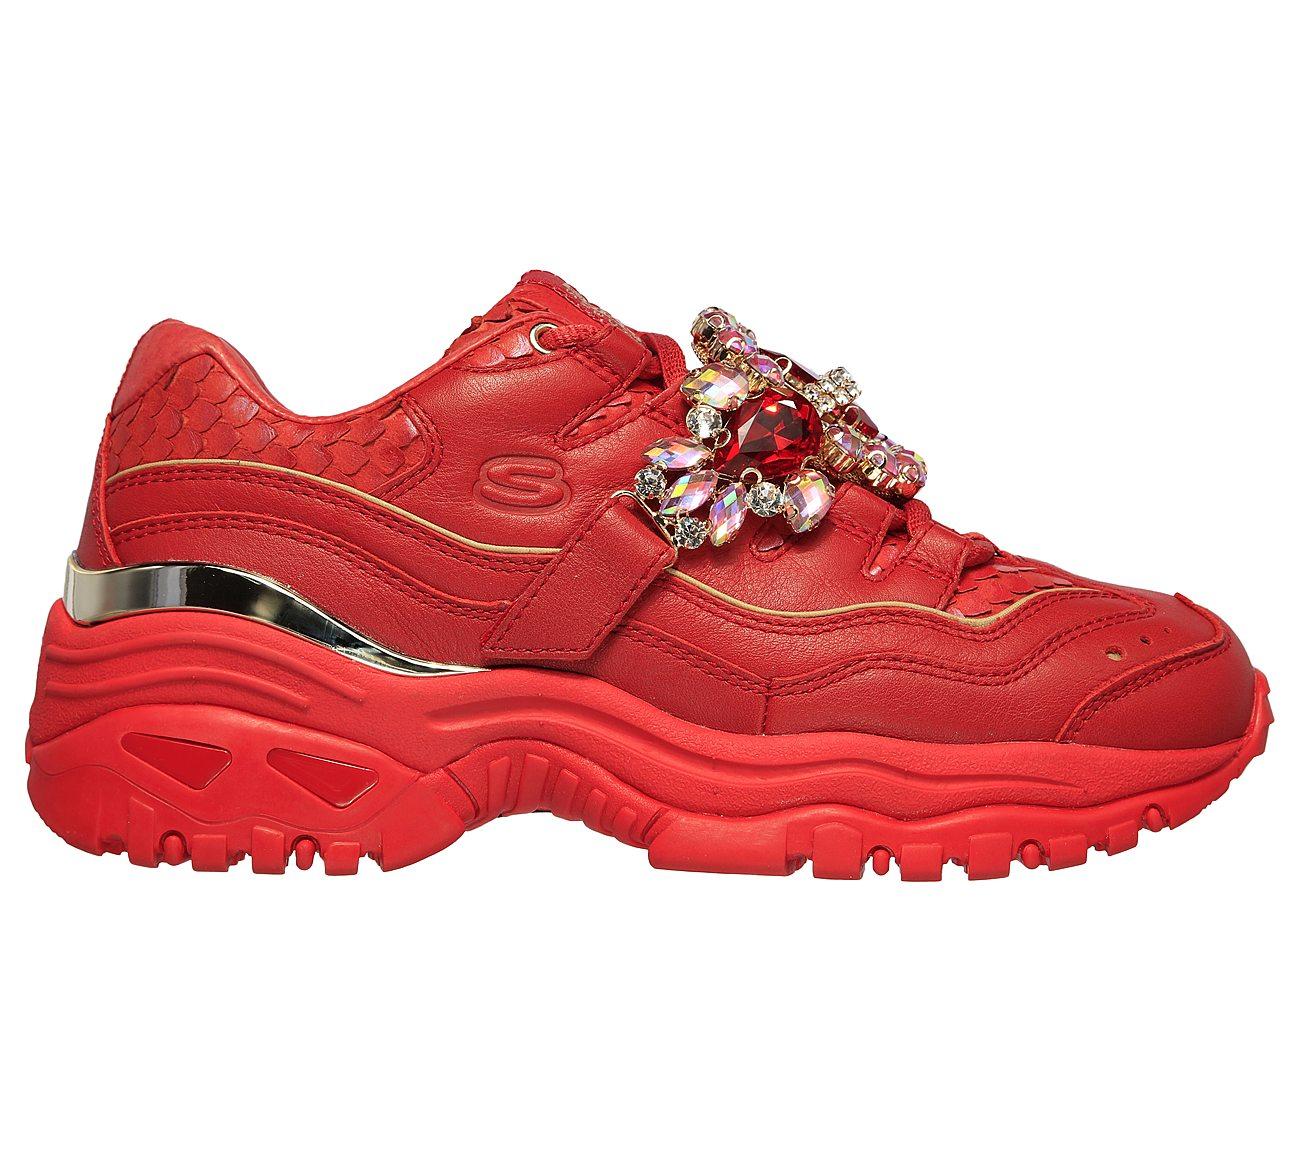 No es suficiente sentido Saga  Plasticita důkaz zpomalit skechers sneakers red old - guamnaturealliance.org